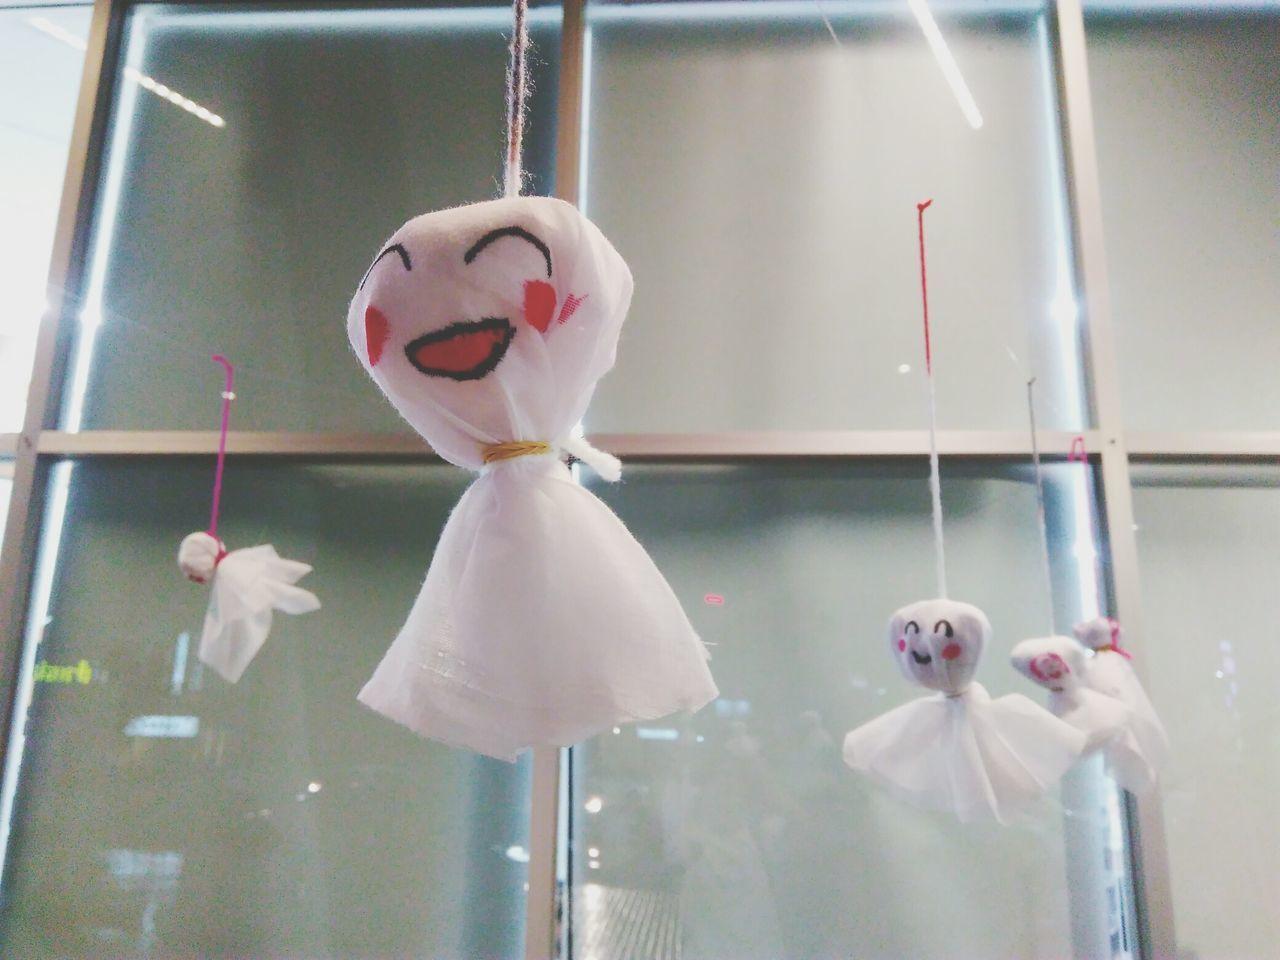 Anti rain doll Design Japanese Style Indoors  Indoors  Kawaii♡ Cute Kawaiii Handmade Raining Season Rain Retail  Culture Thai Food Japan Decoracion Art Indoors  Close-up Decorative Si Racha Thailand Doll Retail  Anti